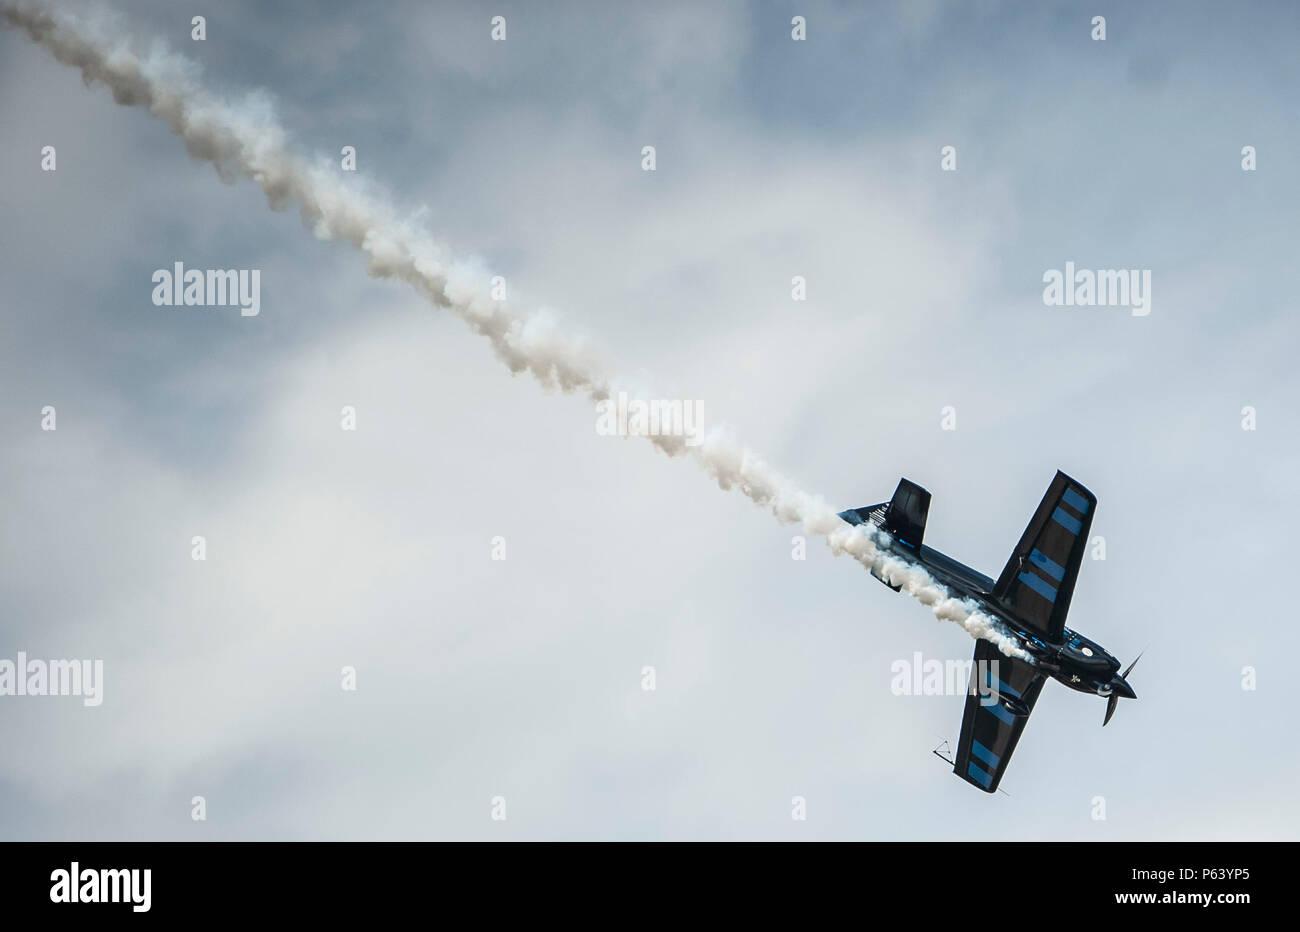 Langley Air Show 2020.Mxs Rh Stock Photos Mxs Rh Stock Images Alamy